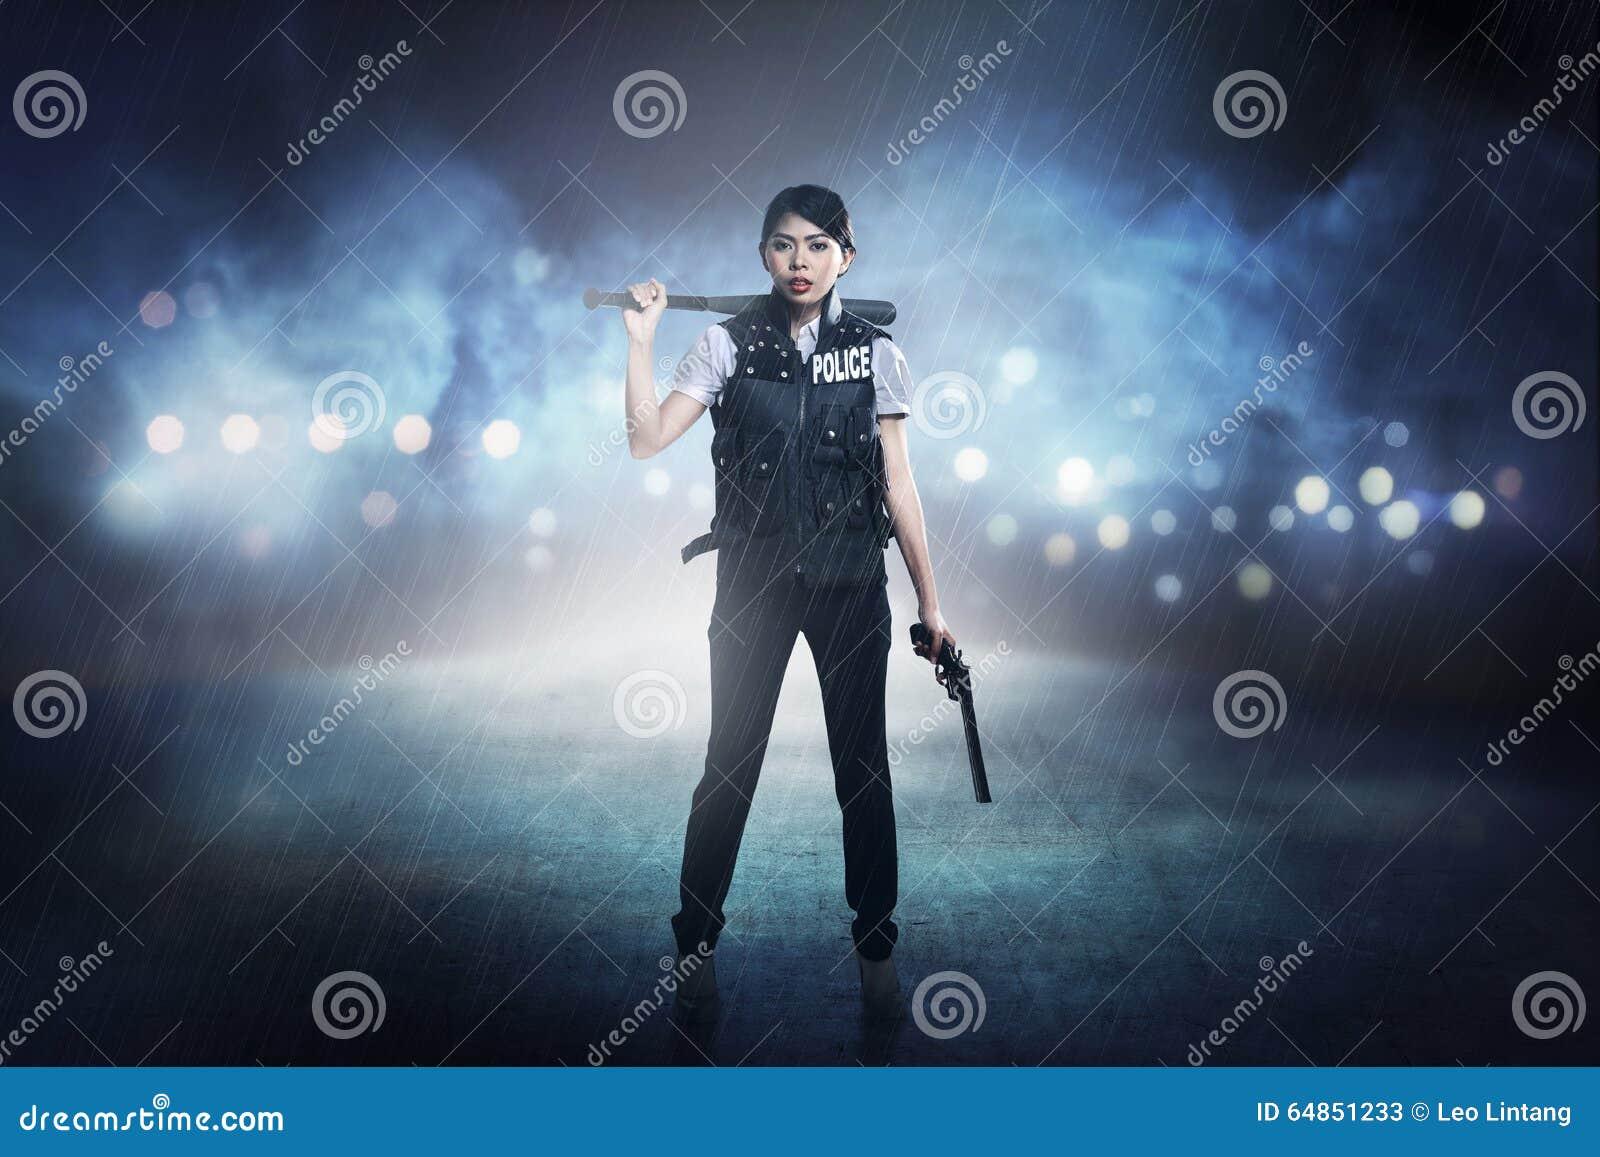 Pretty woman in police vest holding baseball bat